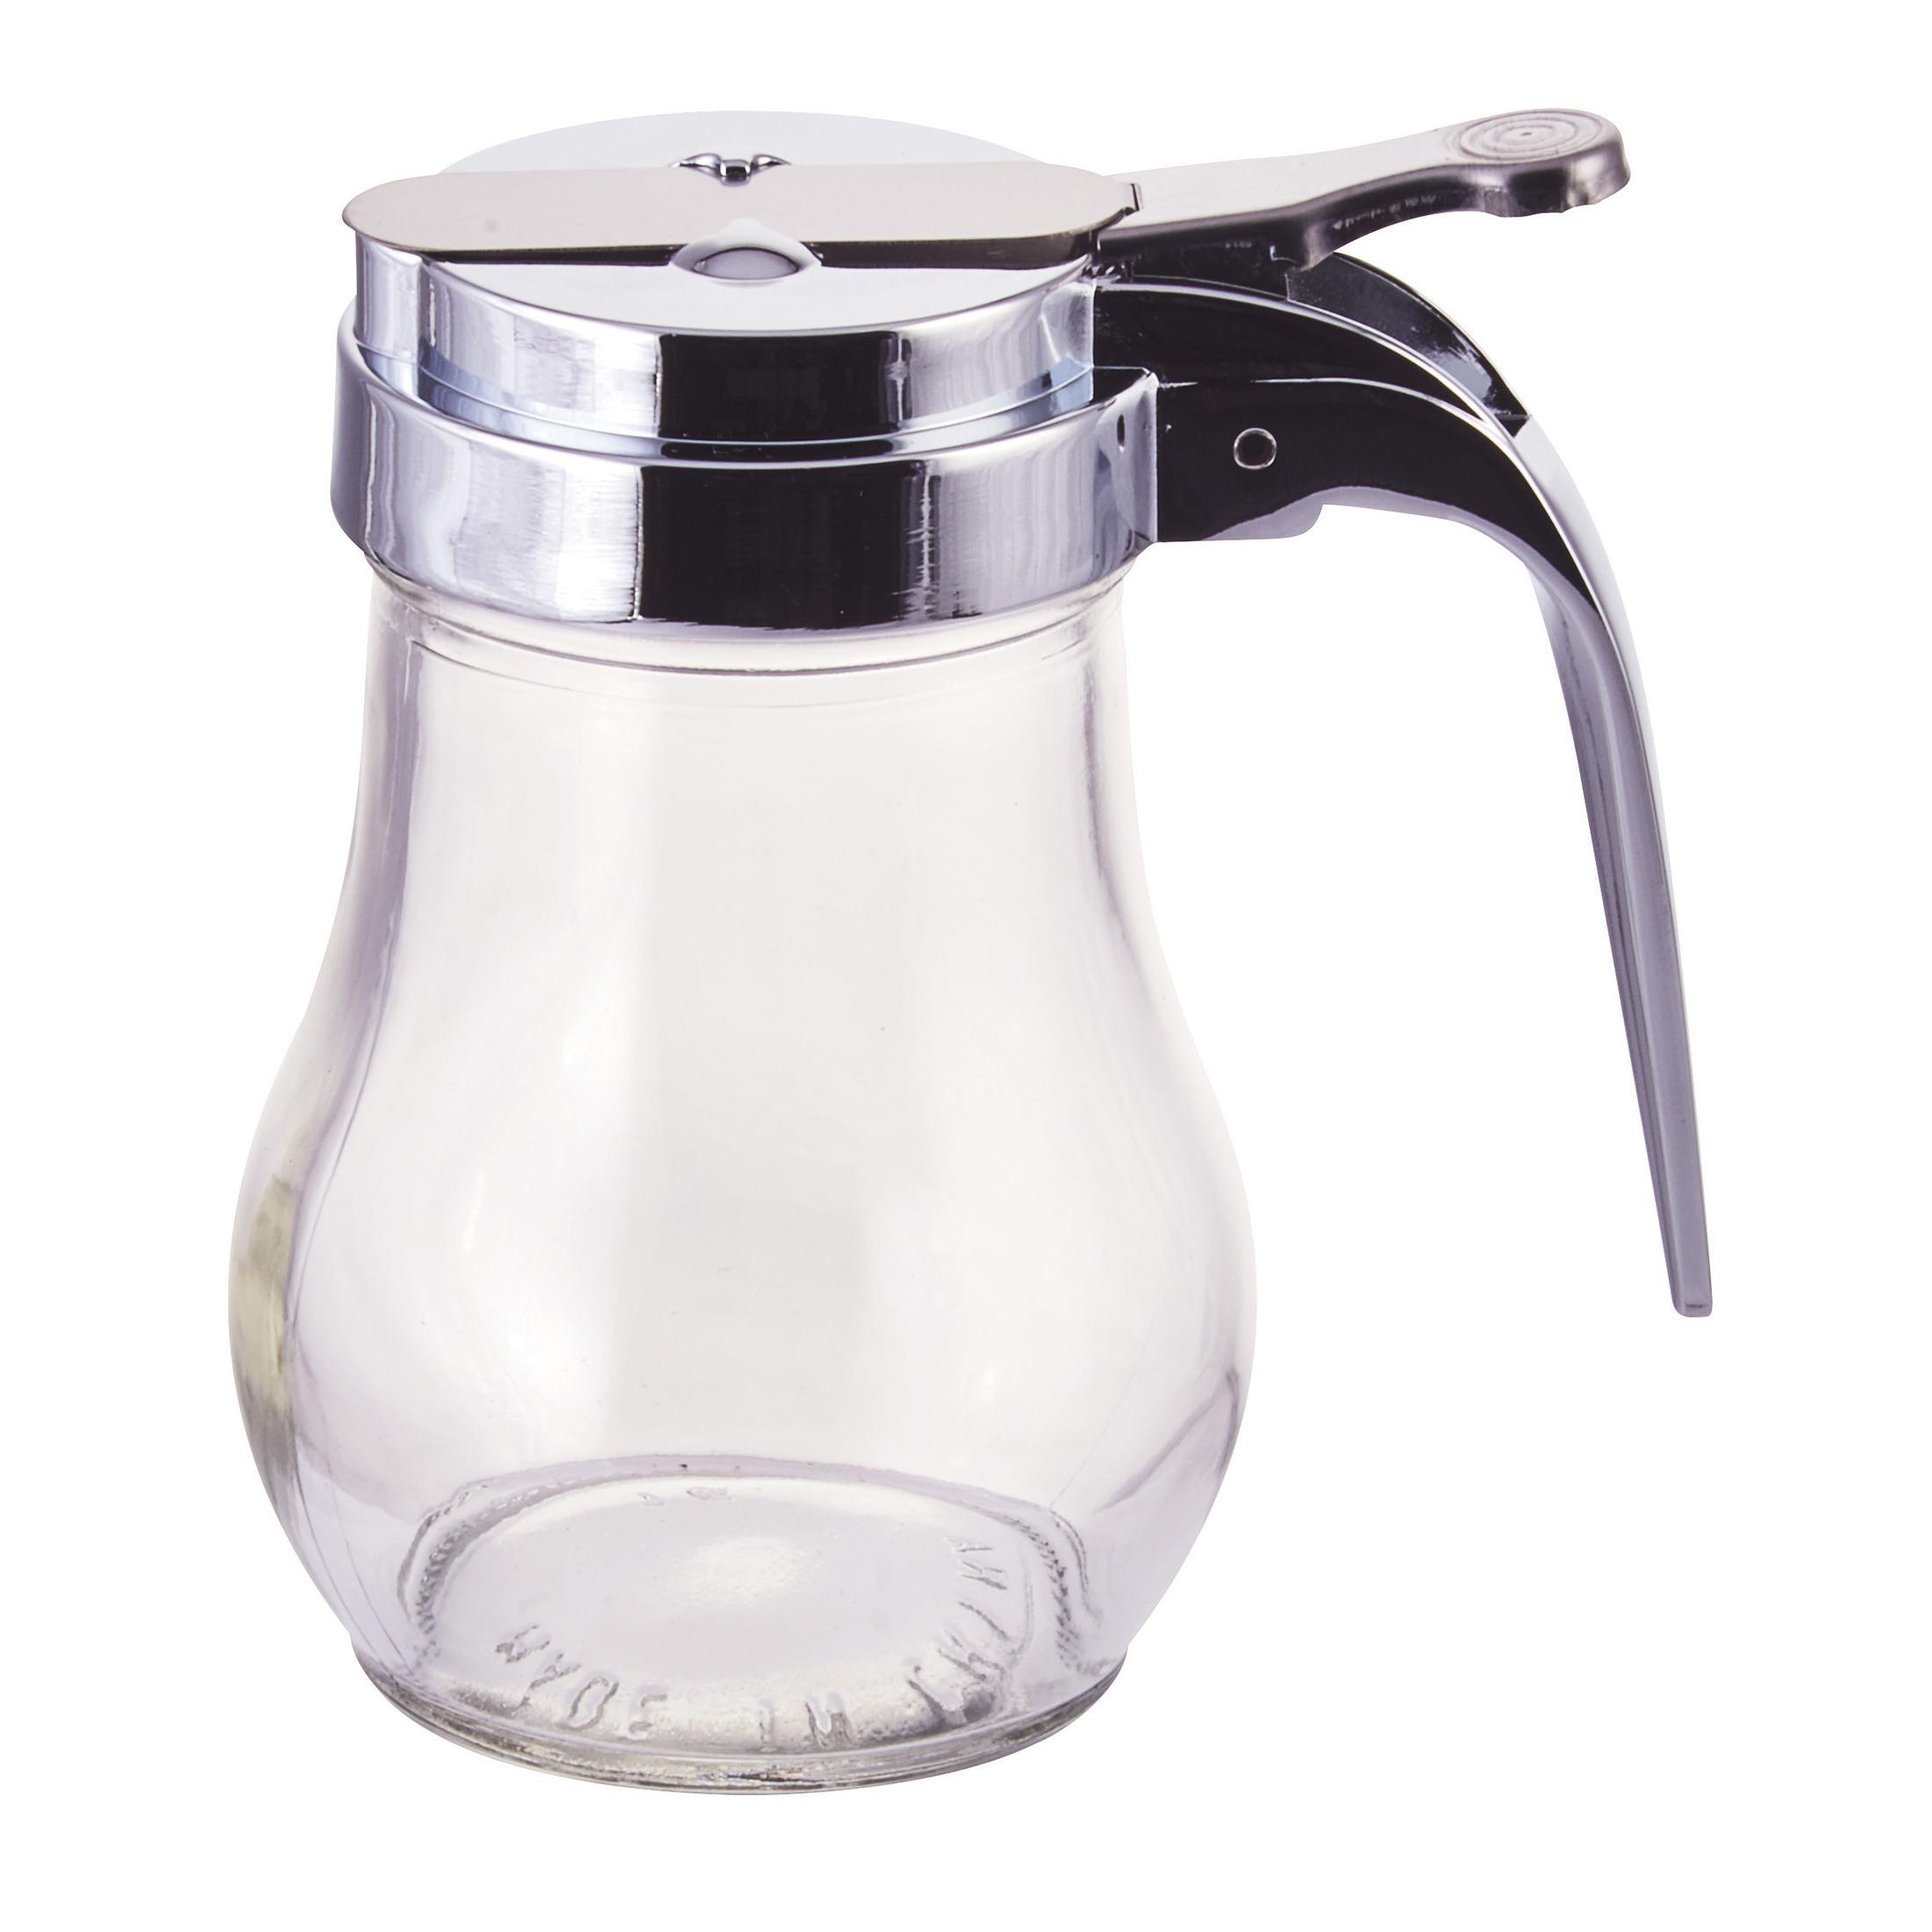 Winco G-115 syrup pourer